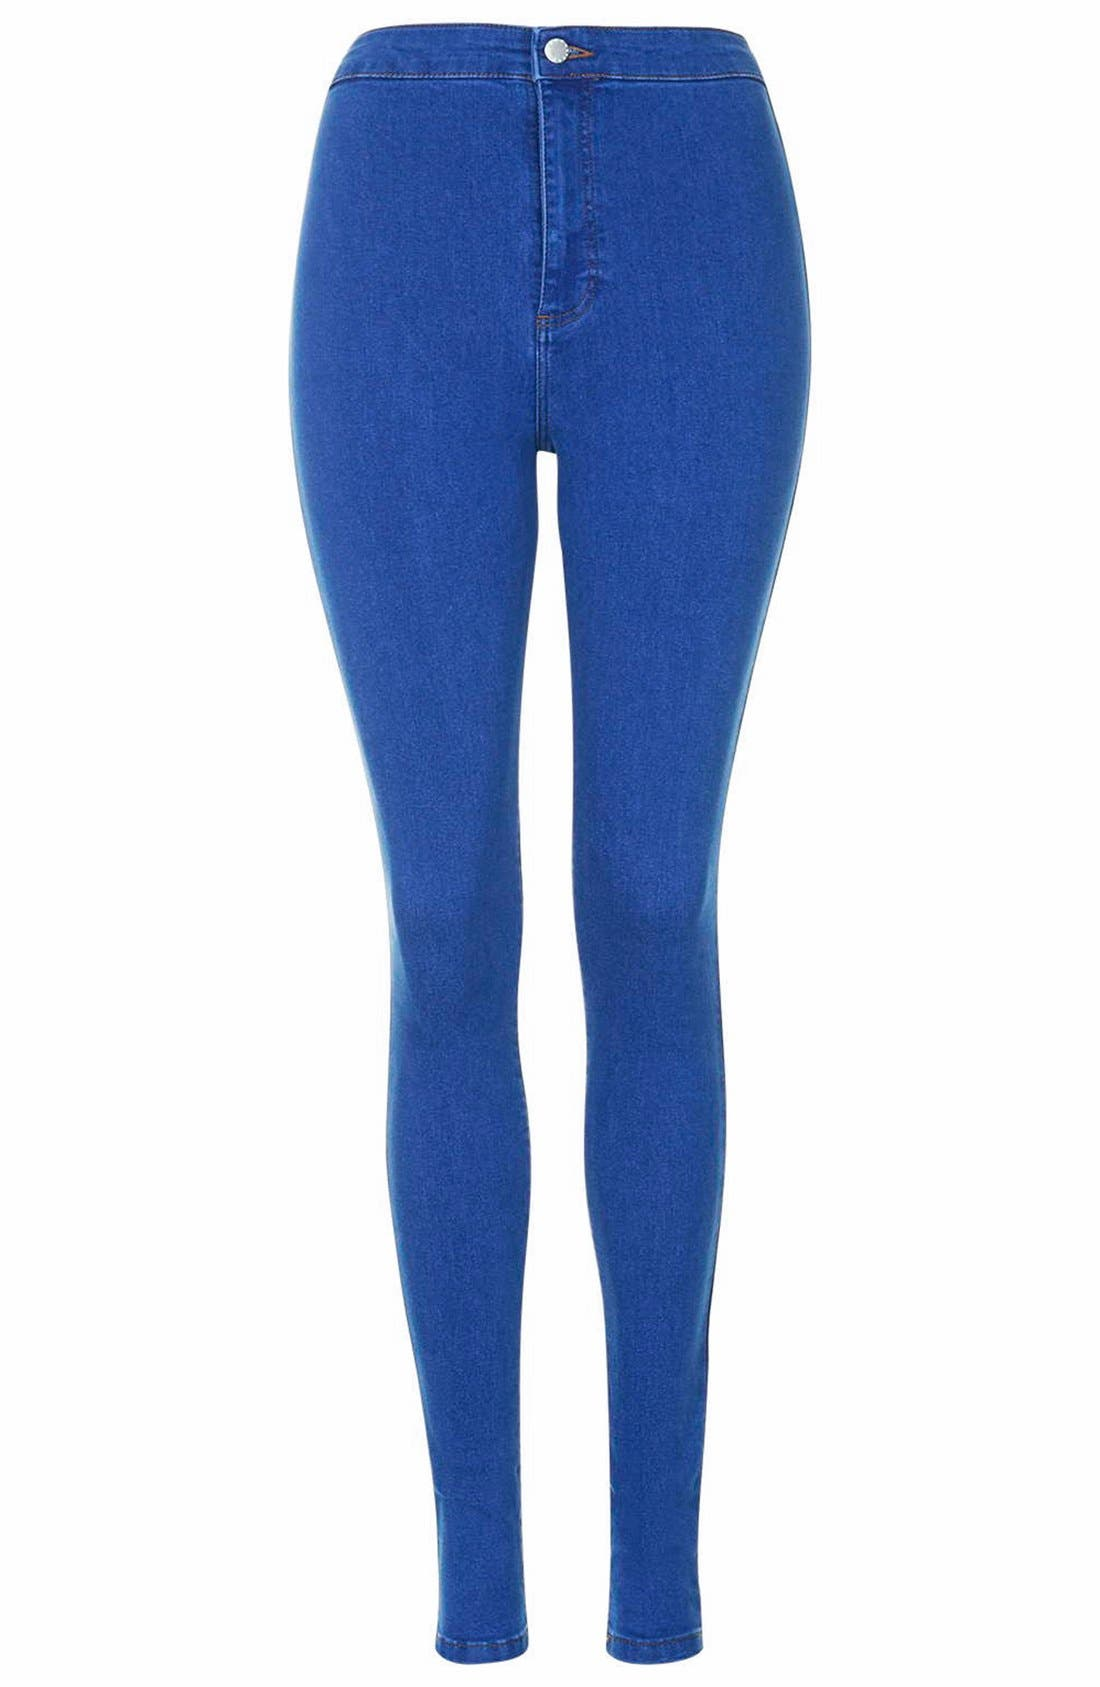 Alternate Image 4  - Topshop'Joni' High Rise Skinny Jeans (Bright Blue)